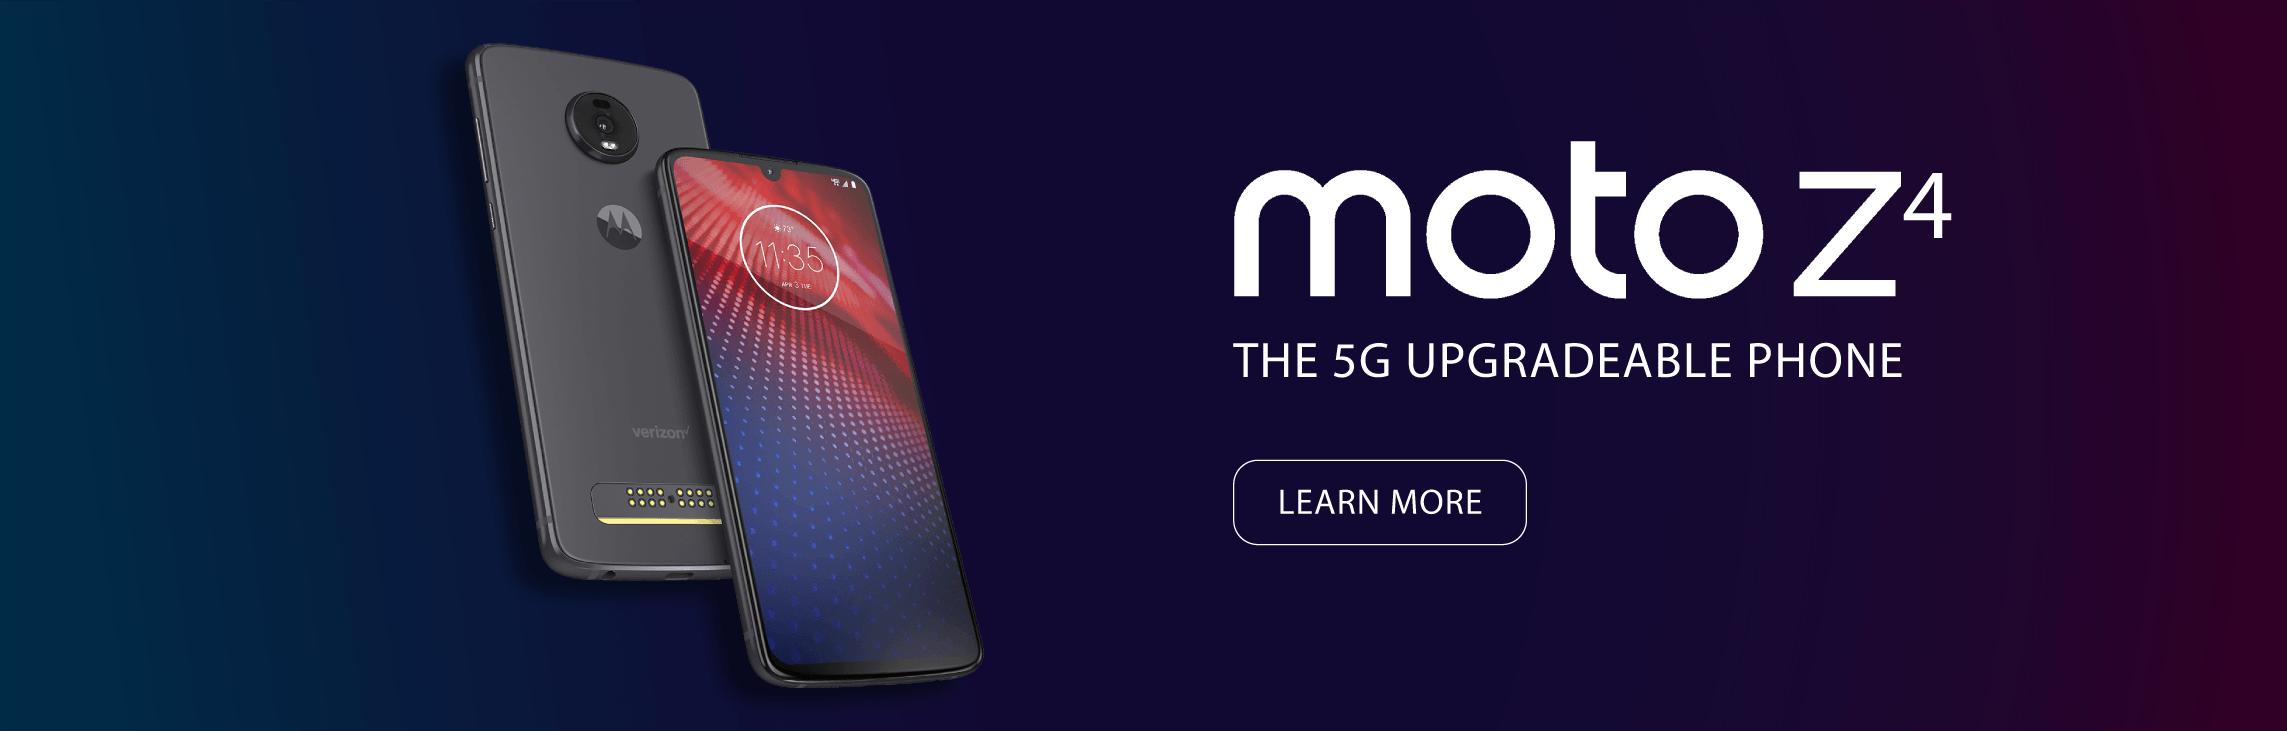 Motorola Moto Z4 Phone